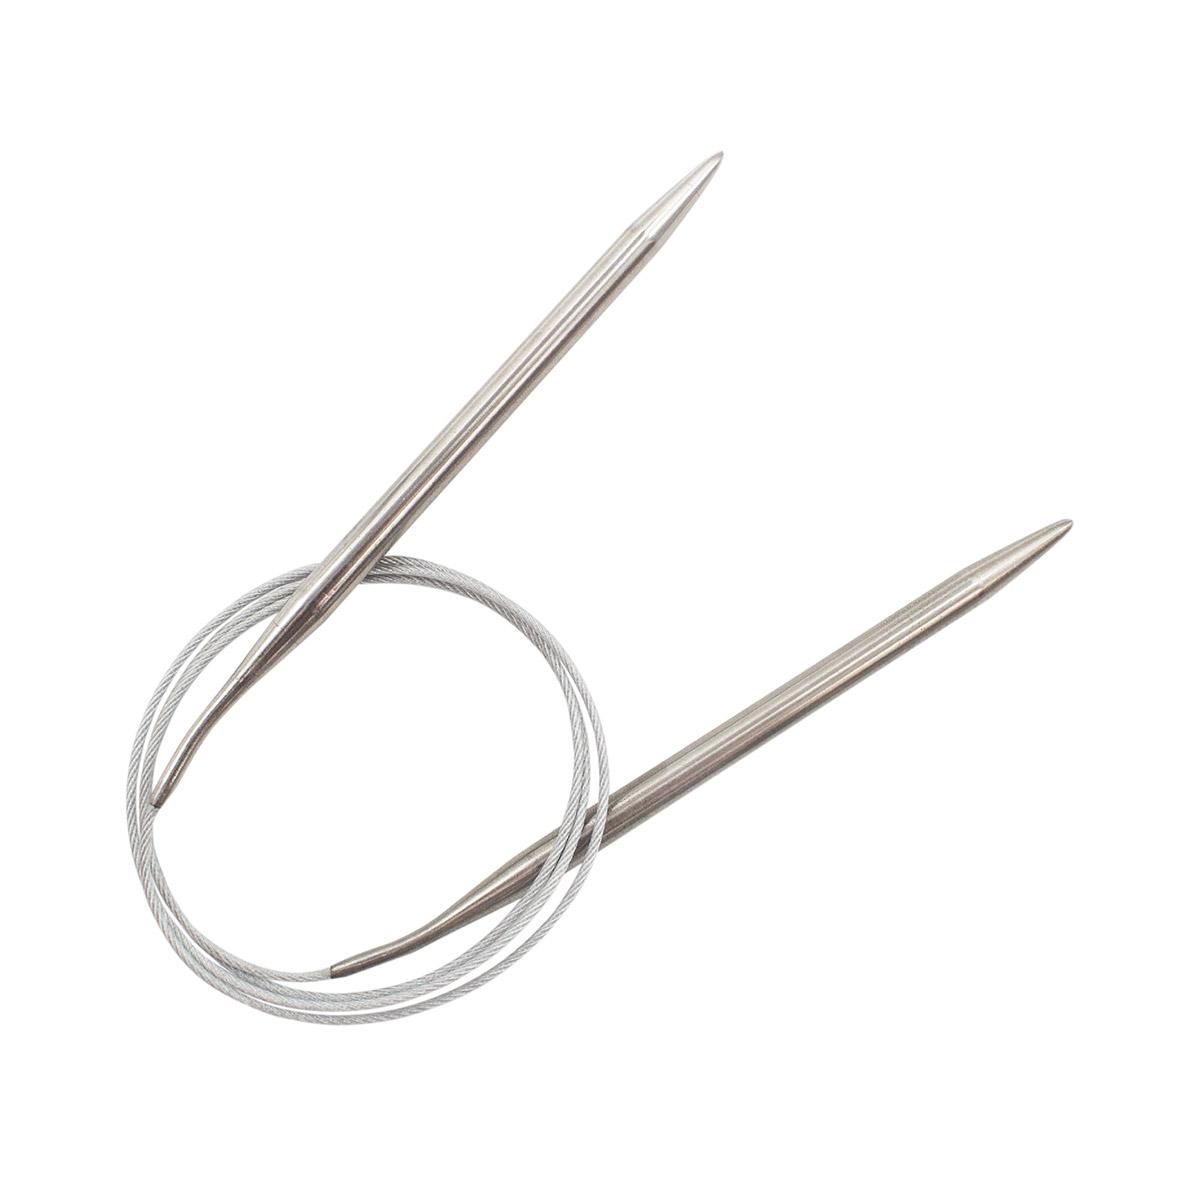 Спицы круговые металл 941170, 100 см, 7,0 мм, Hobby&Pro